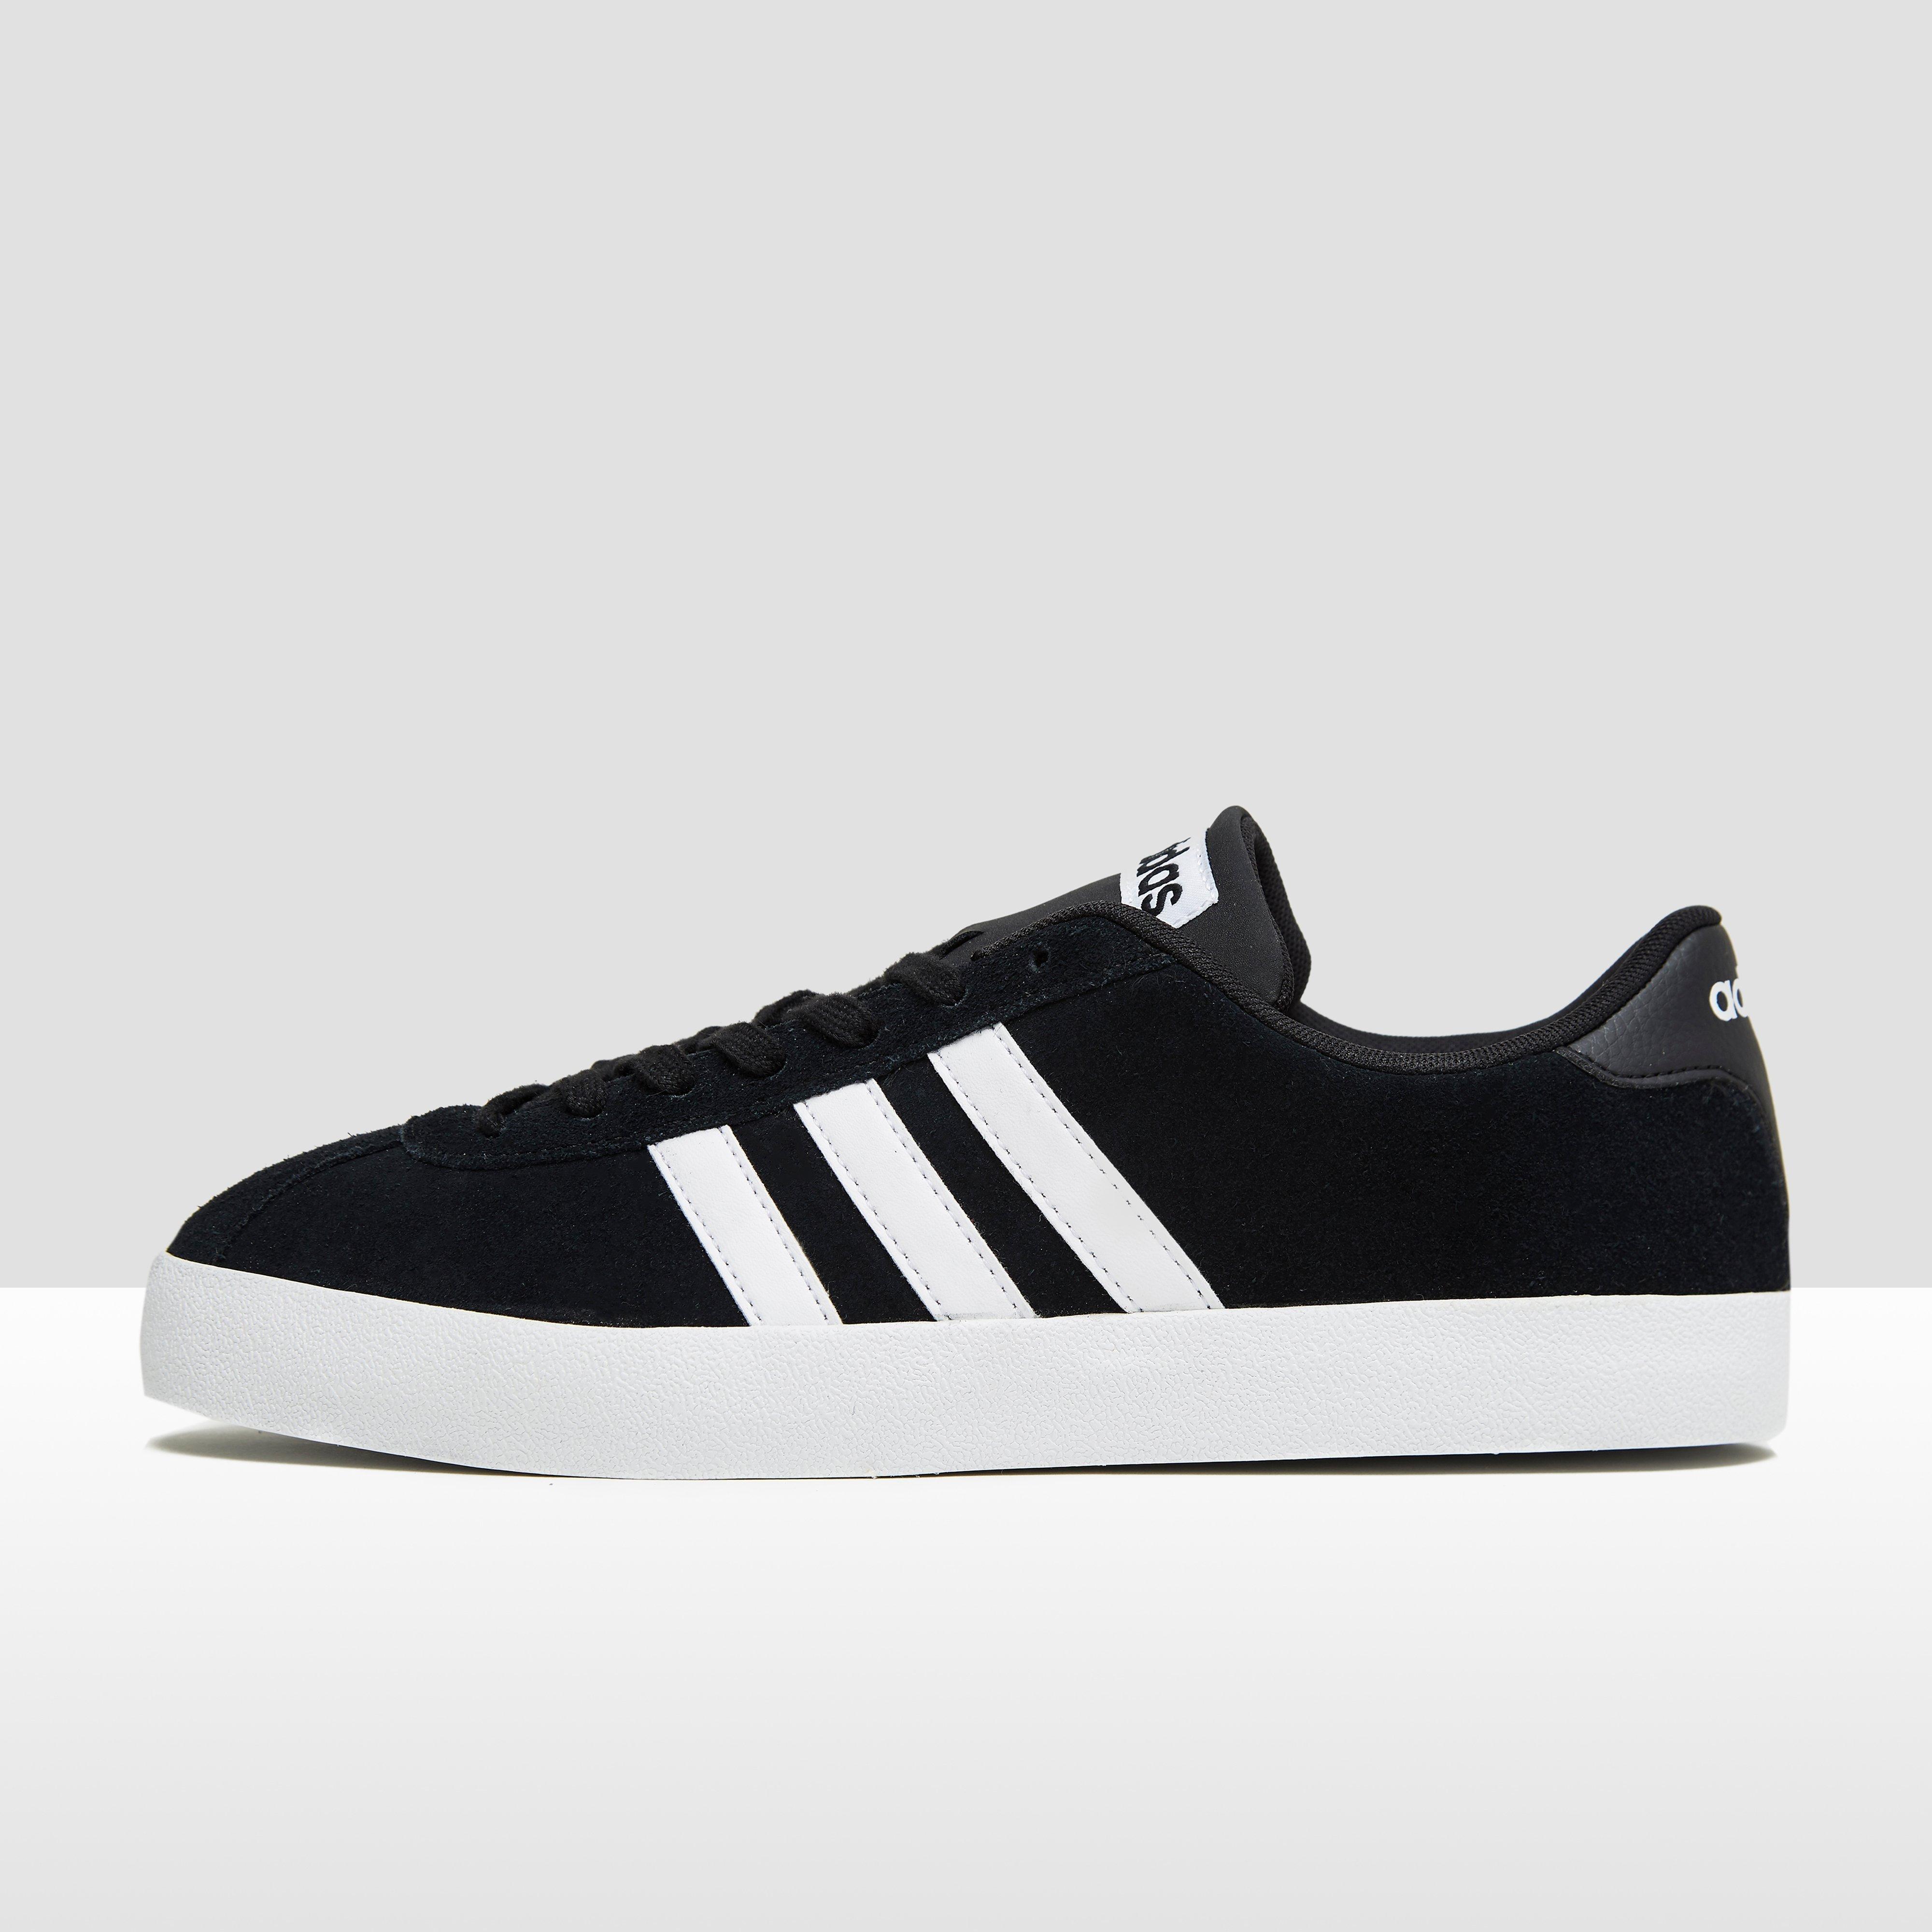 Adidas - Court Vulc Sneakers - Hommes - Chaussures De Sport - Noir - 42 2/3 DfnyeO935